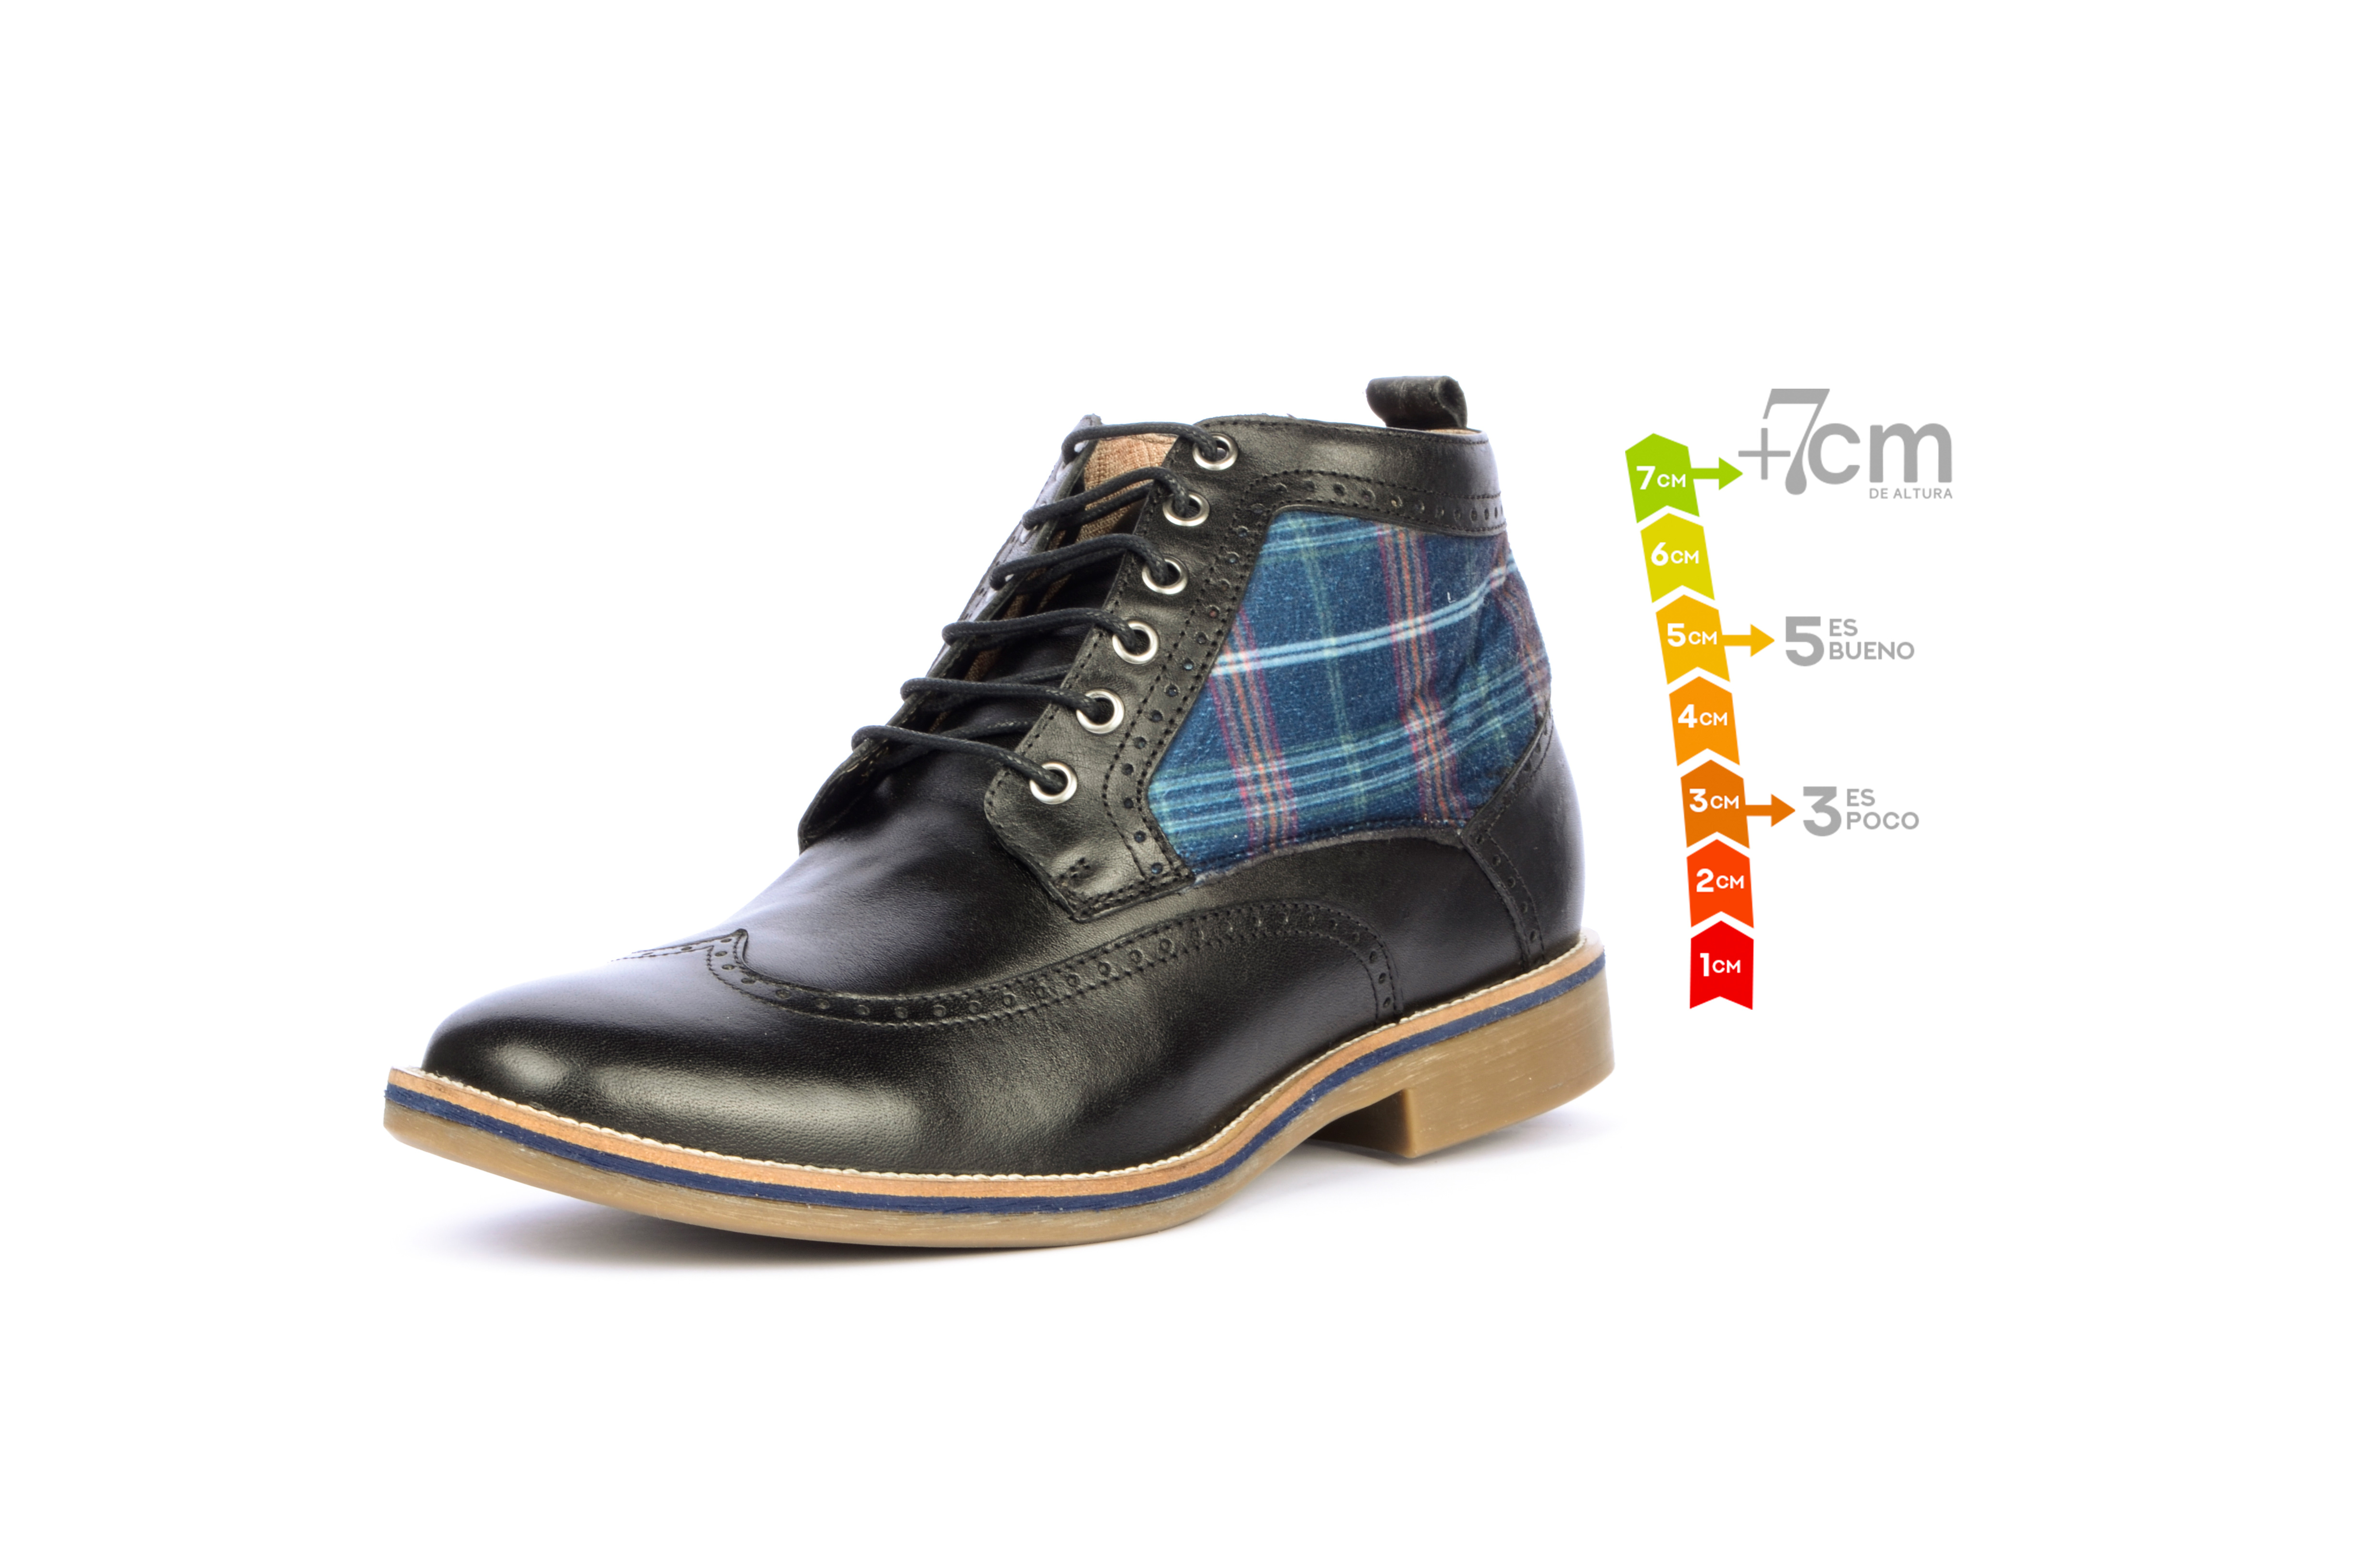 Hipster Scottish Negro +7cms